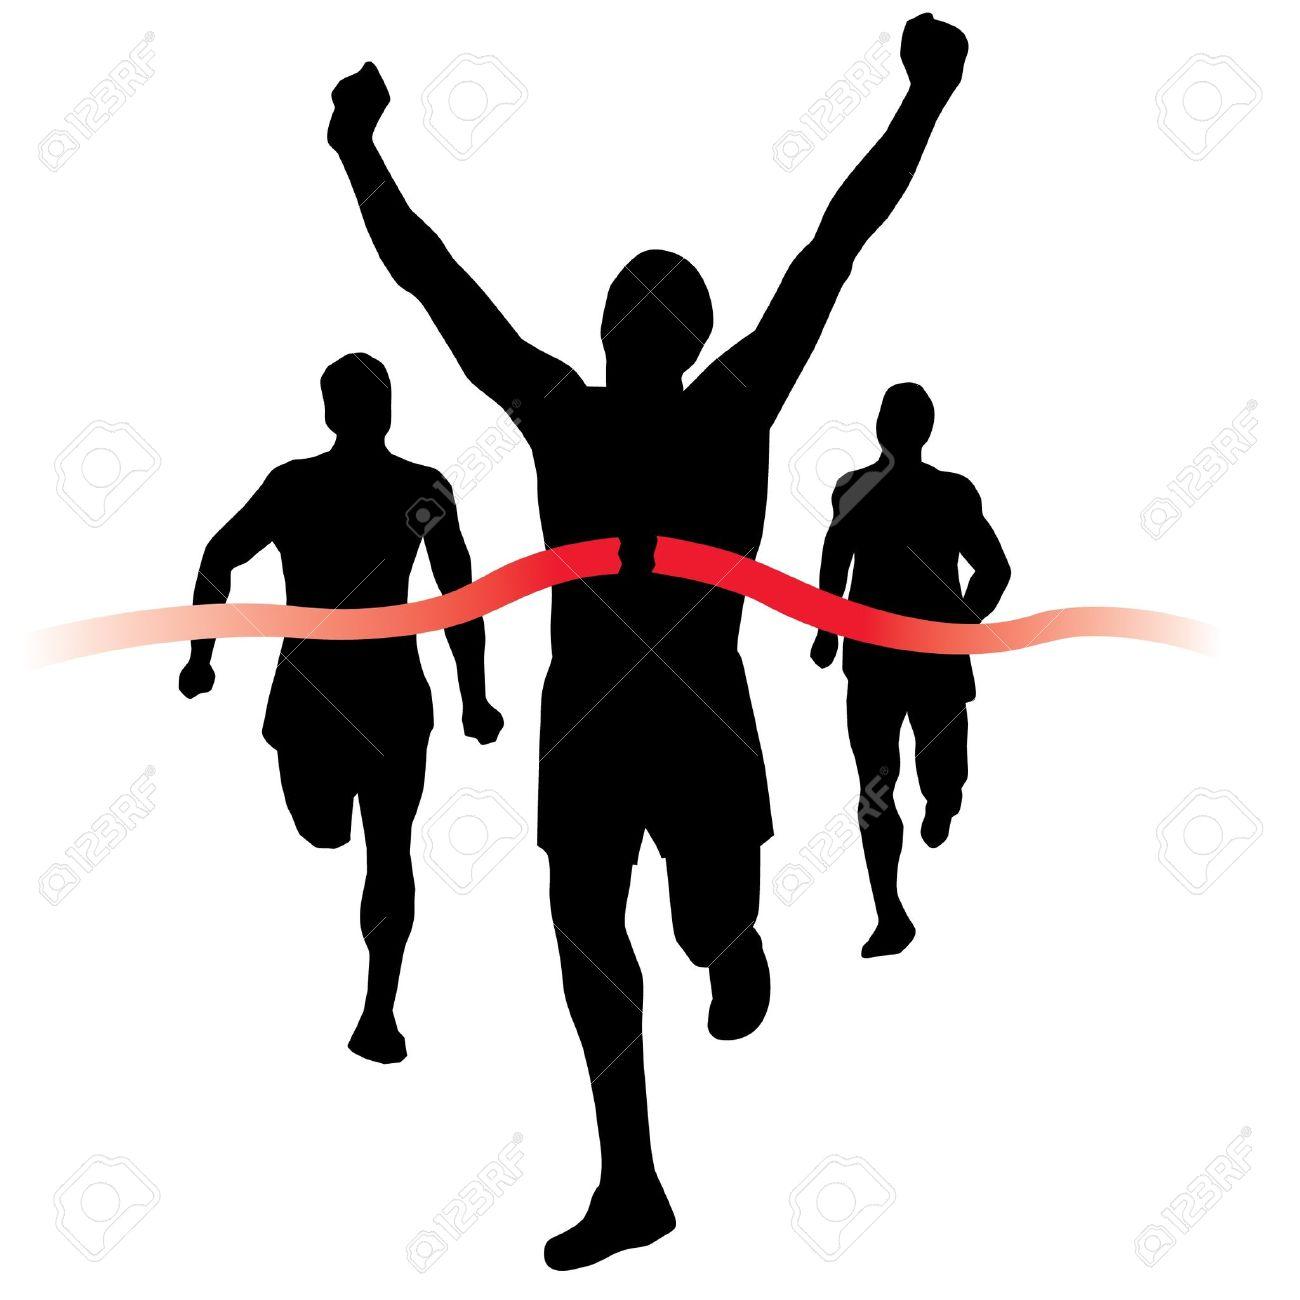 Clip Art Runners Finish Line .-Clip Art Runners Finish Line .-3